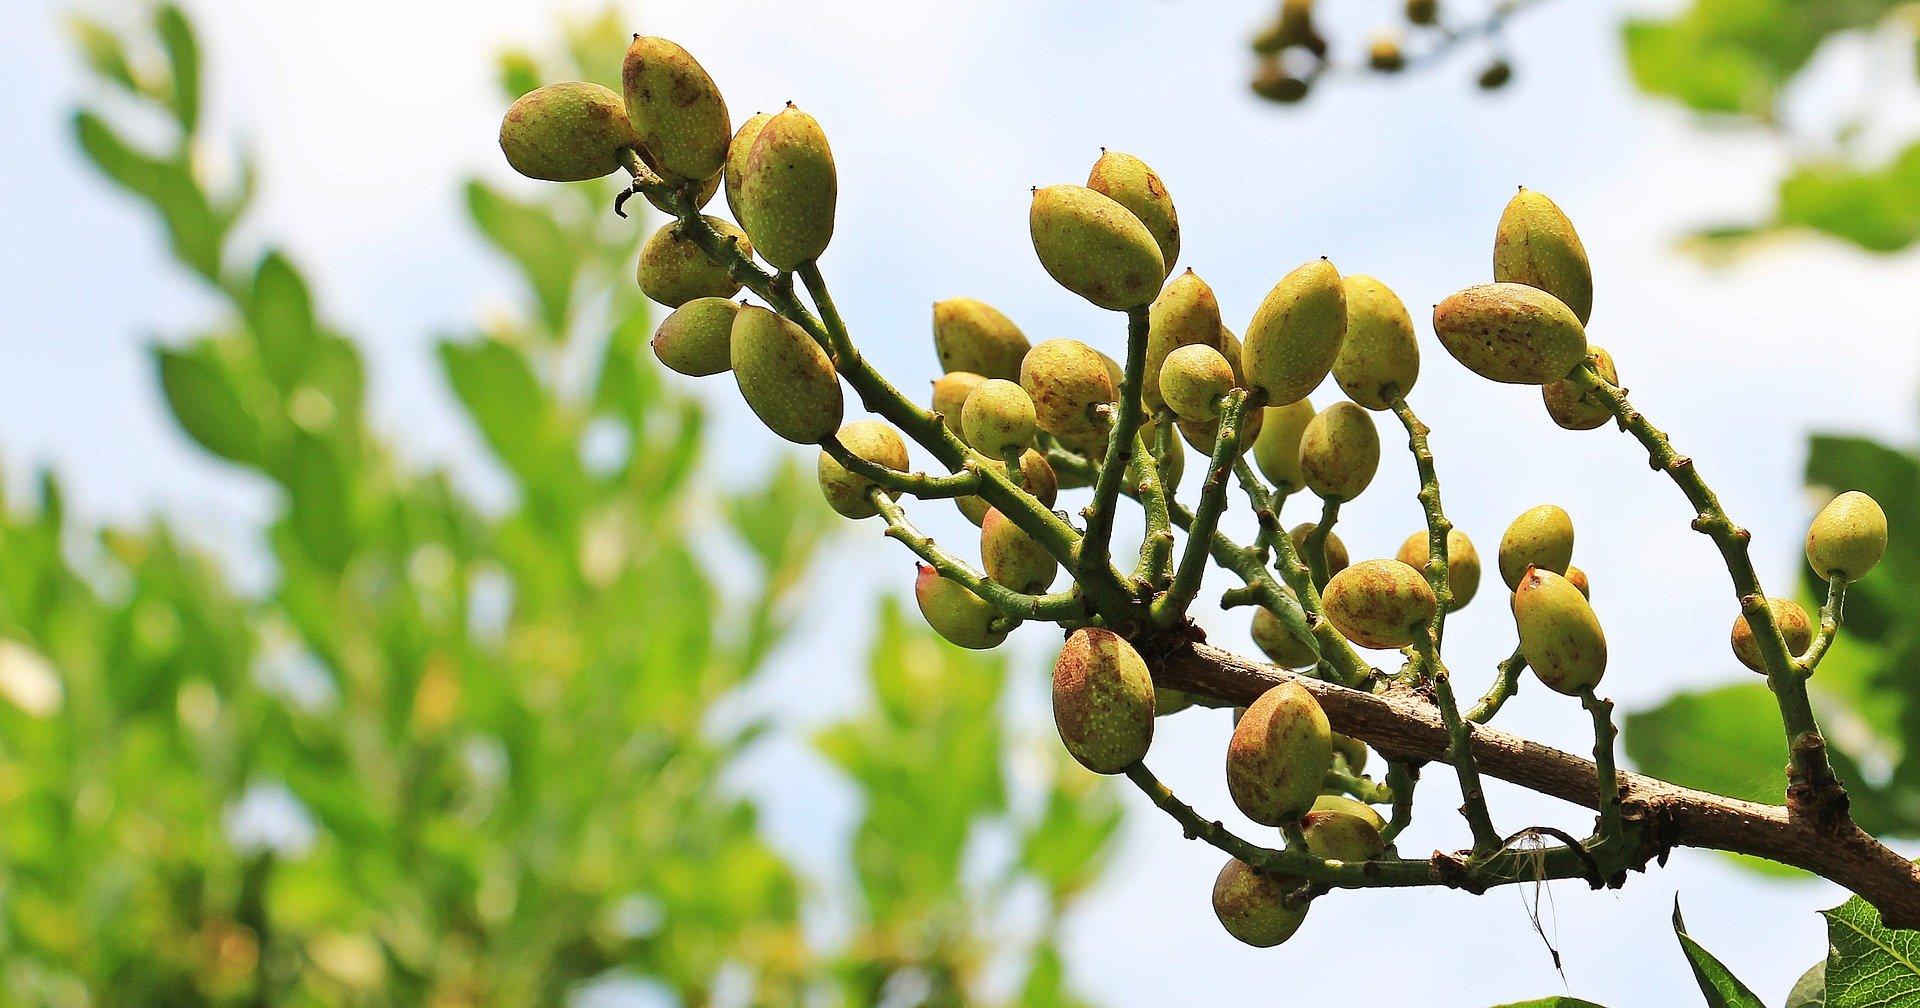 recoleccion pistacho maduracion pistacho